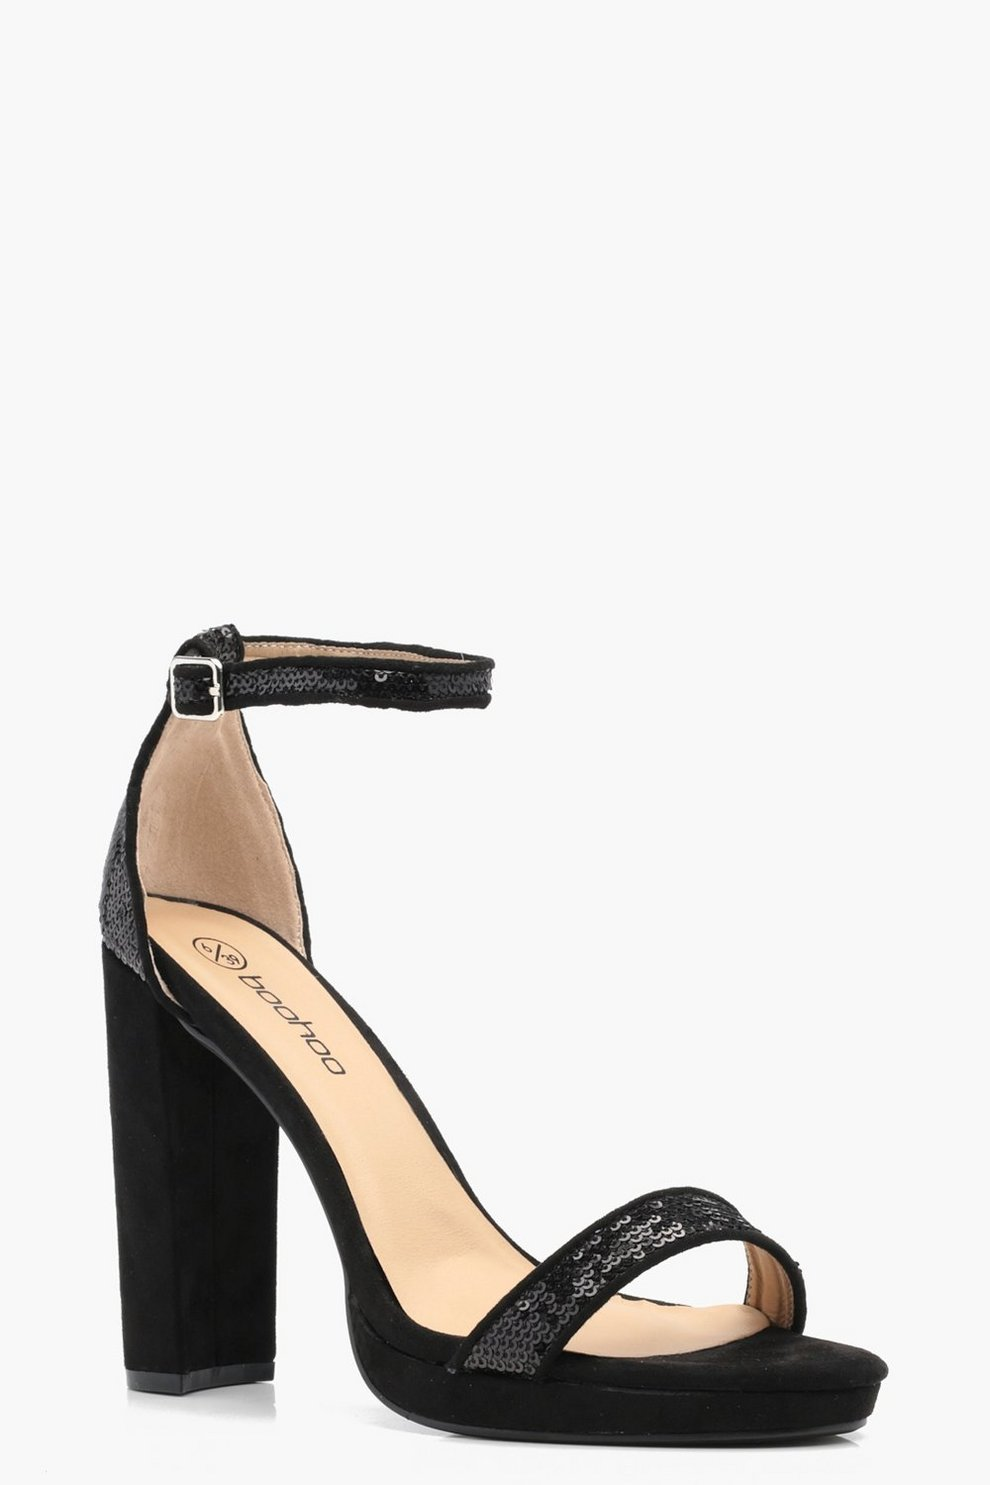 026ffabab22b Daisy Sequin Trim Block Platform Heels